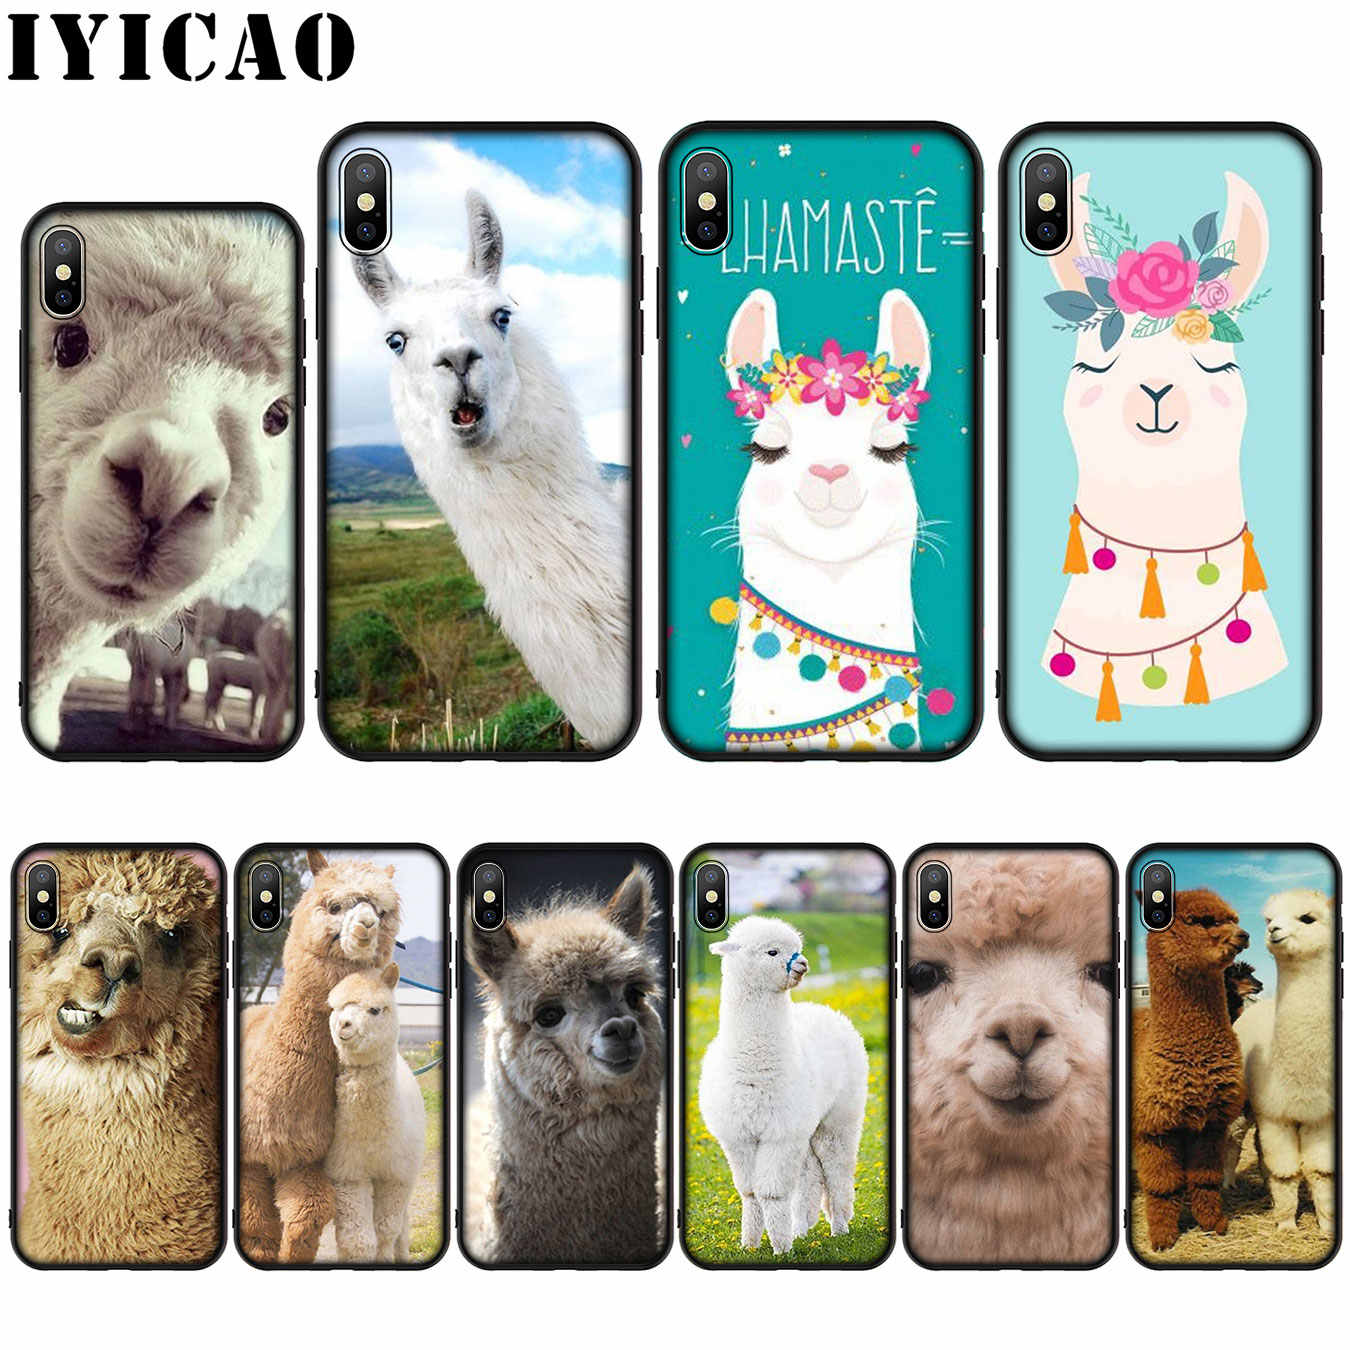 Llama Who? iPhone 11 case